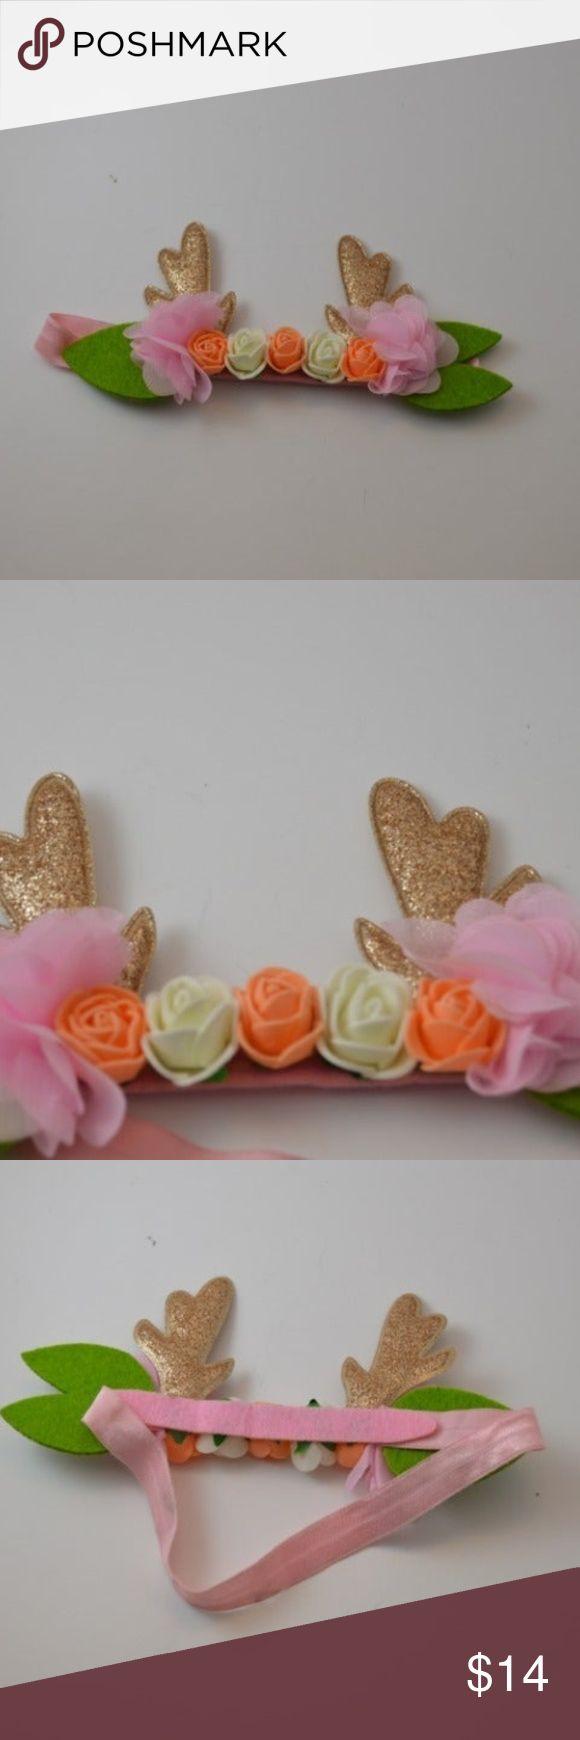 Baby Girl Floral Antler Headband In 2020 Baby Girl